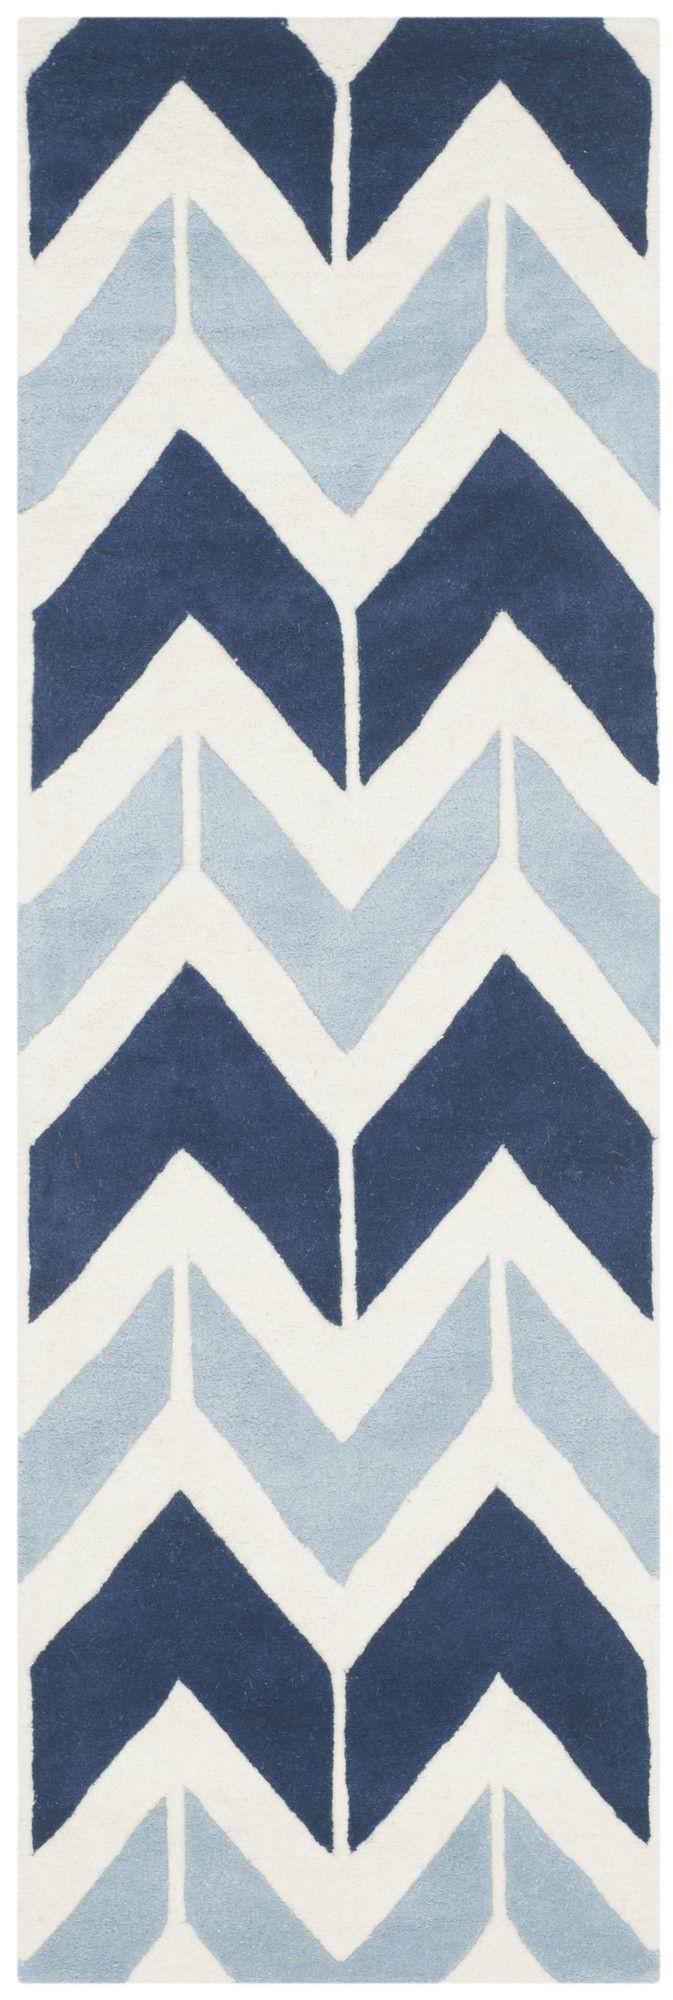 chatham dark blue light blue area rug